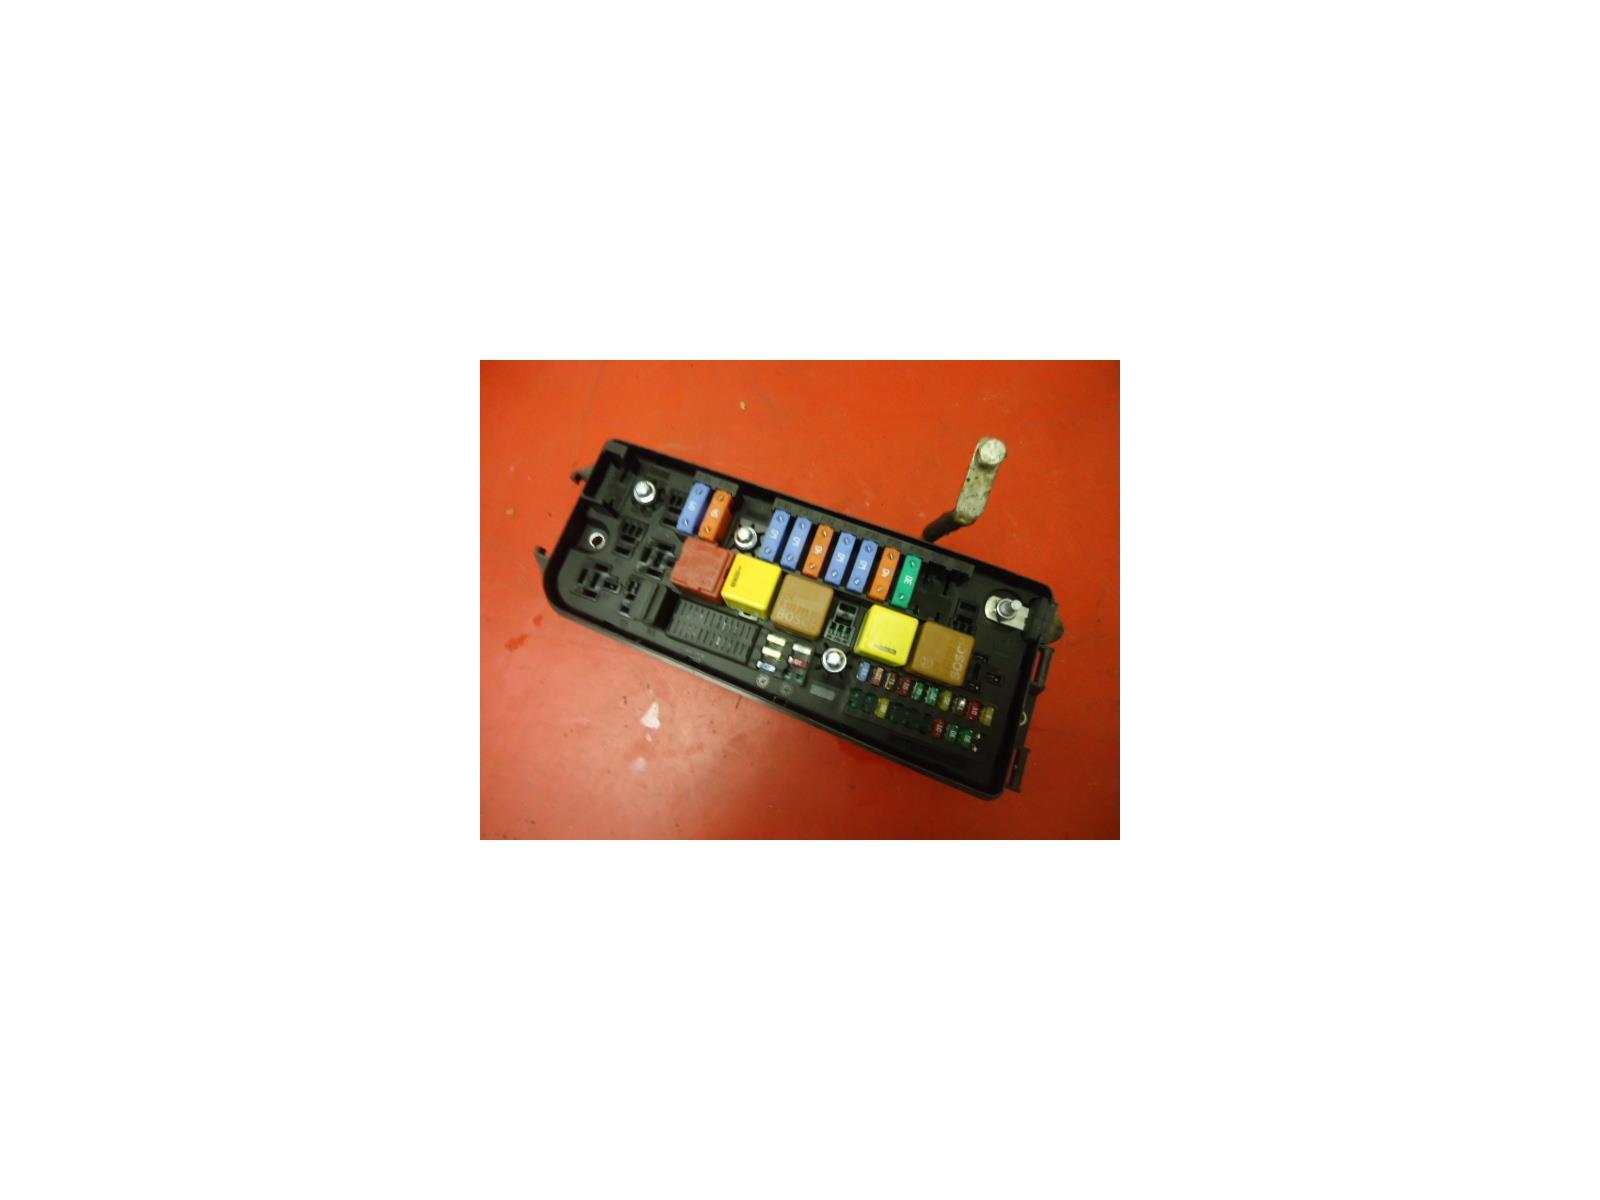 VAUXHALL VECTRA C UNDER BONNET CONTROL UEC FUSE BOX 13144709 UQ 02-05